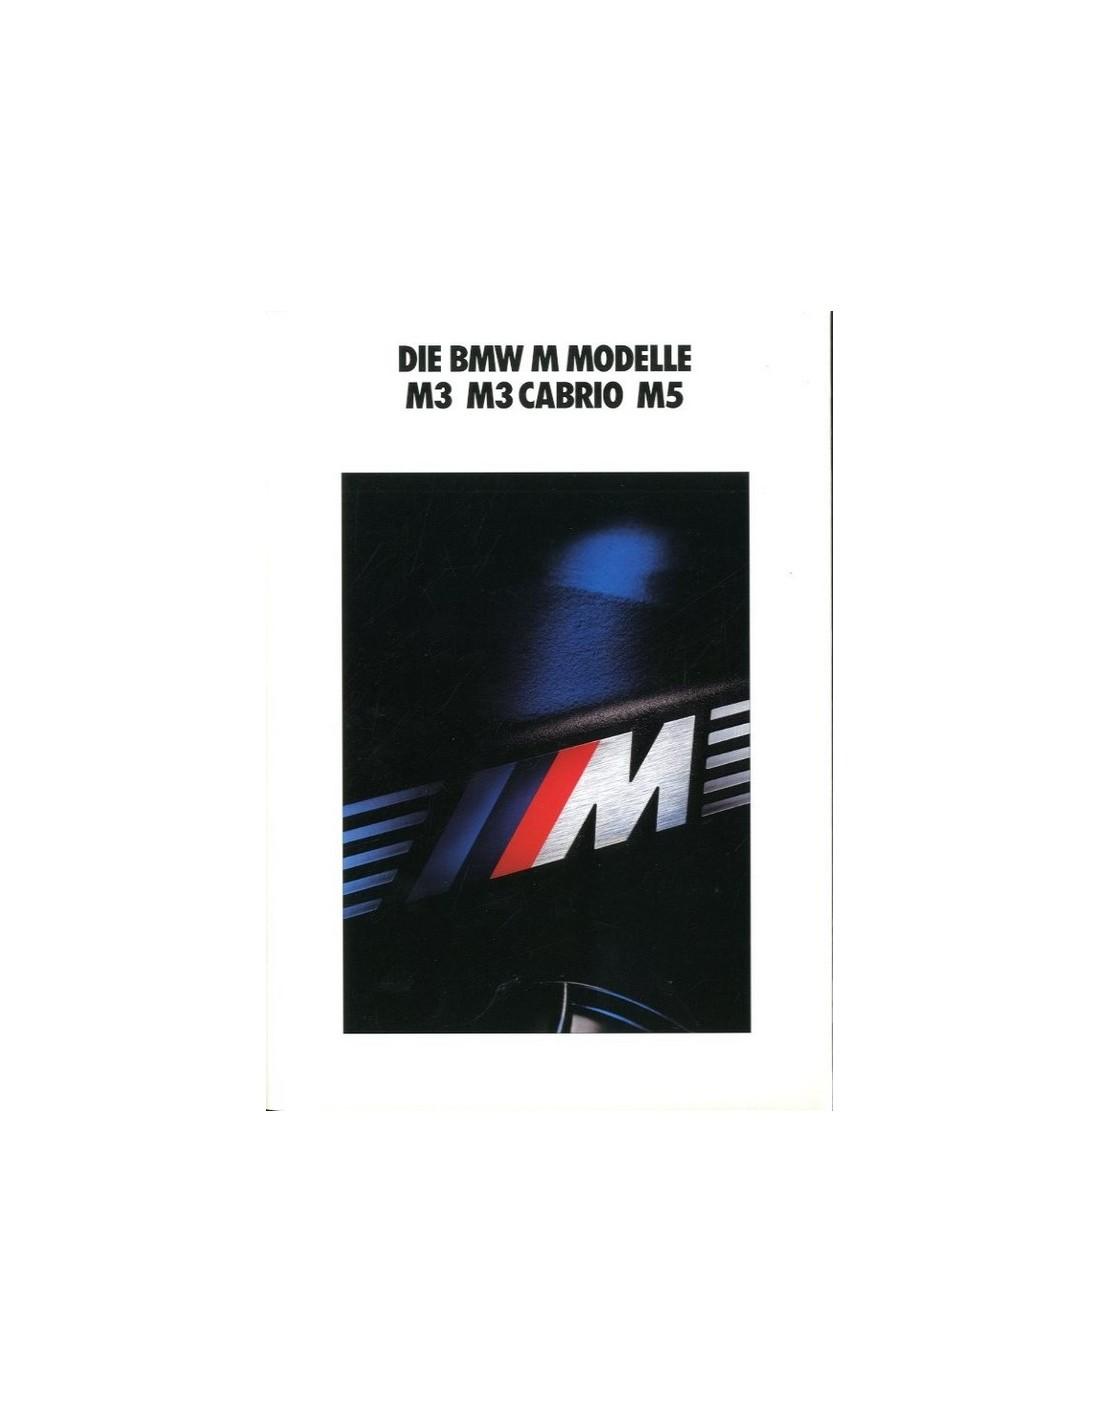 Bmw Z3 Brochure: 1990 BMW M3 CONVERTIBLE M5 BROCHURE GERMAN